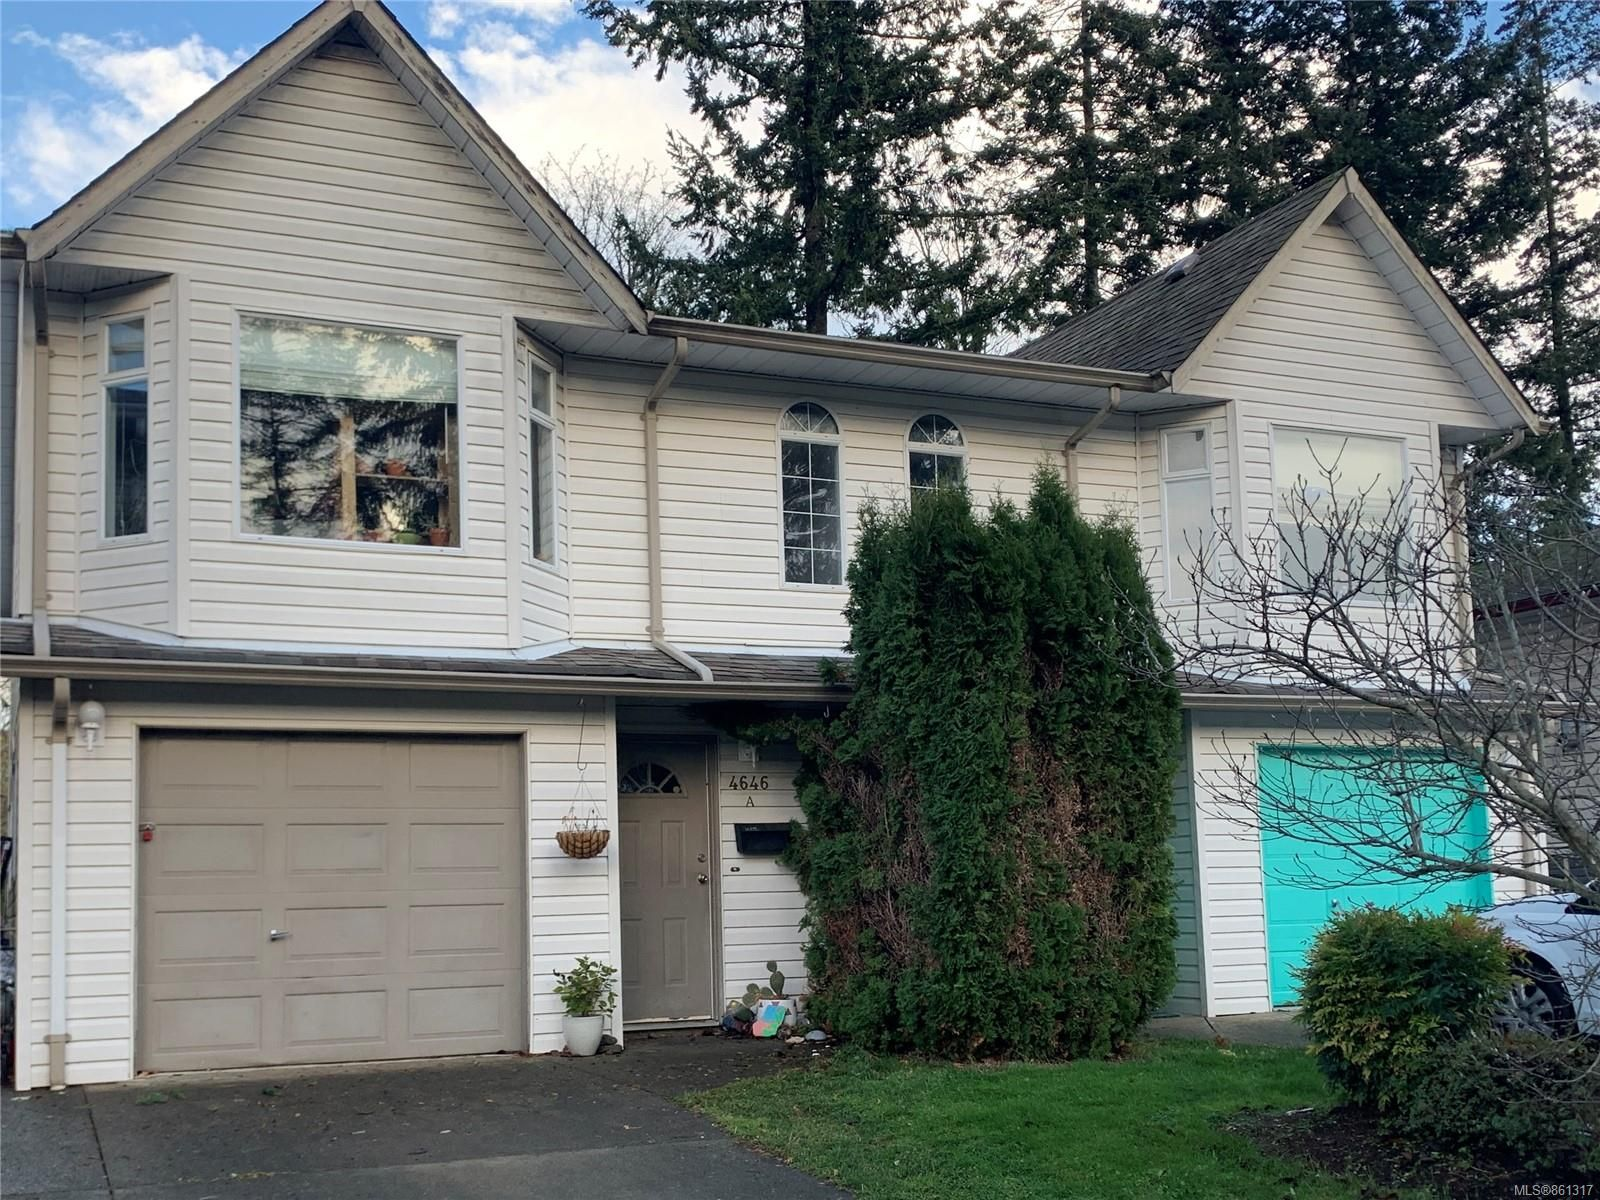 Main Photo: A 4646 Northland Pl in : CV Courtenay East Half Duplex for sale (Comox Valley)  : MLS®# 861317